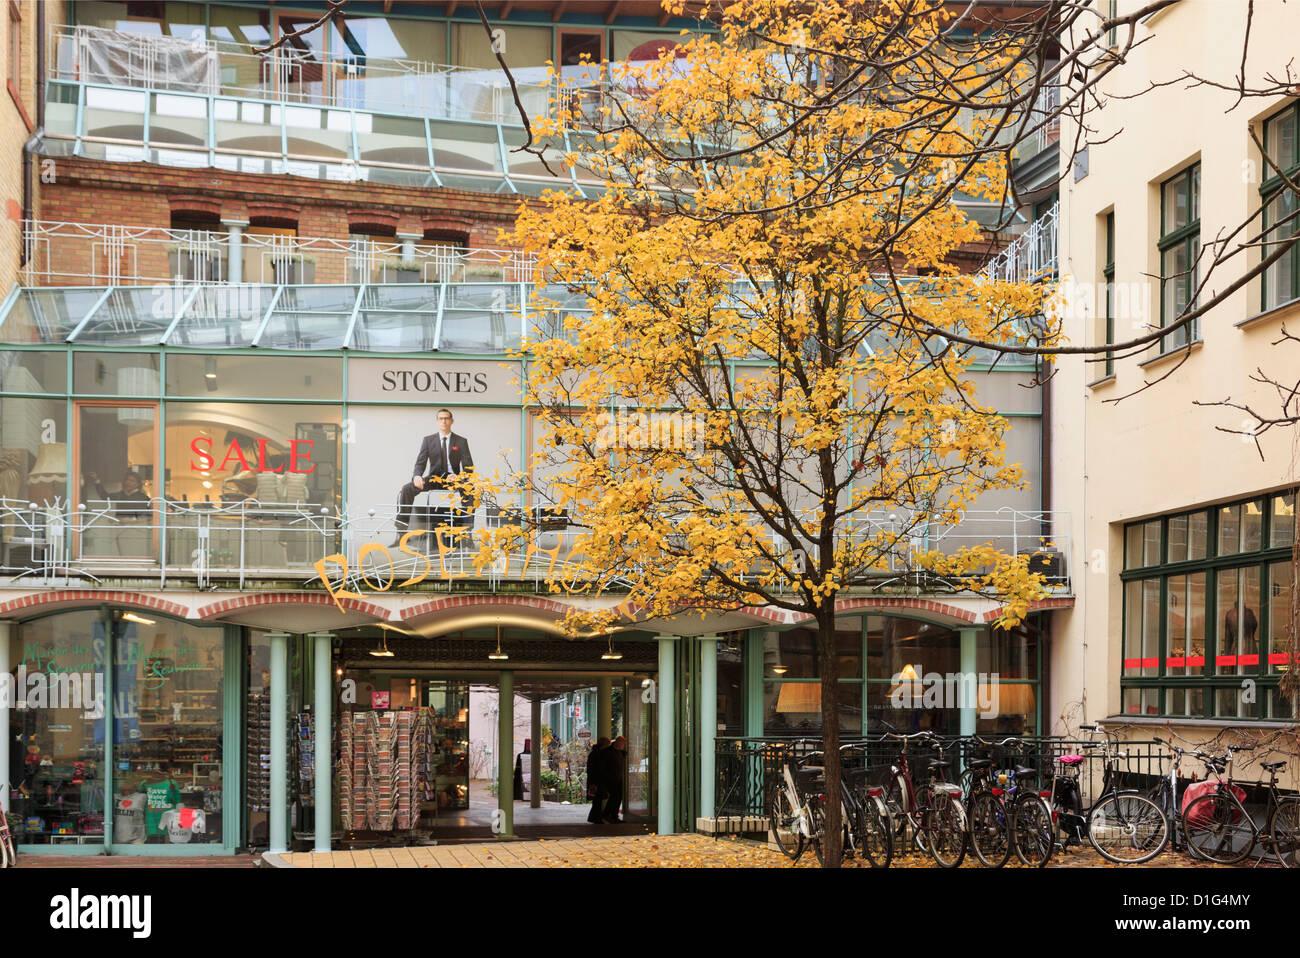 Trendy shops in the historic garden courtyards of Hackesche Hofe in former east Berlin, Germany - Stock Image